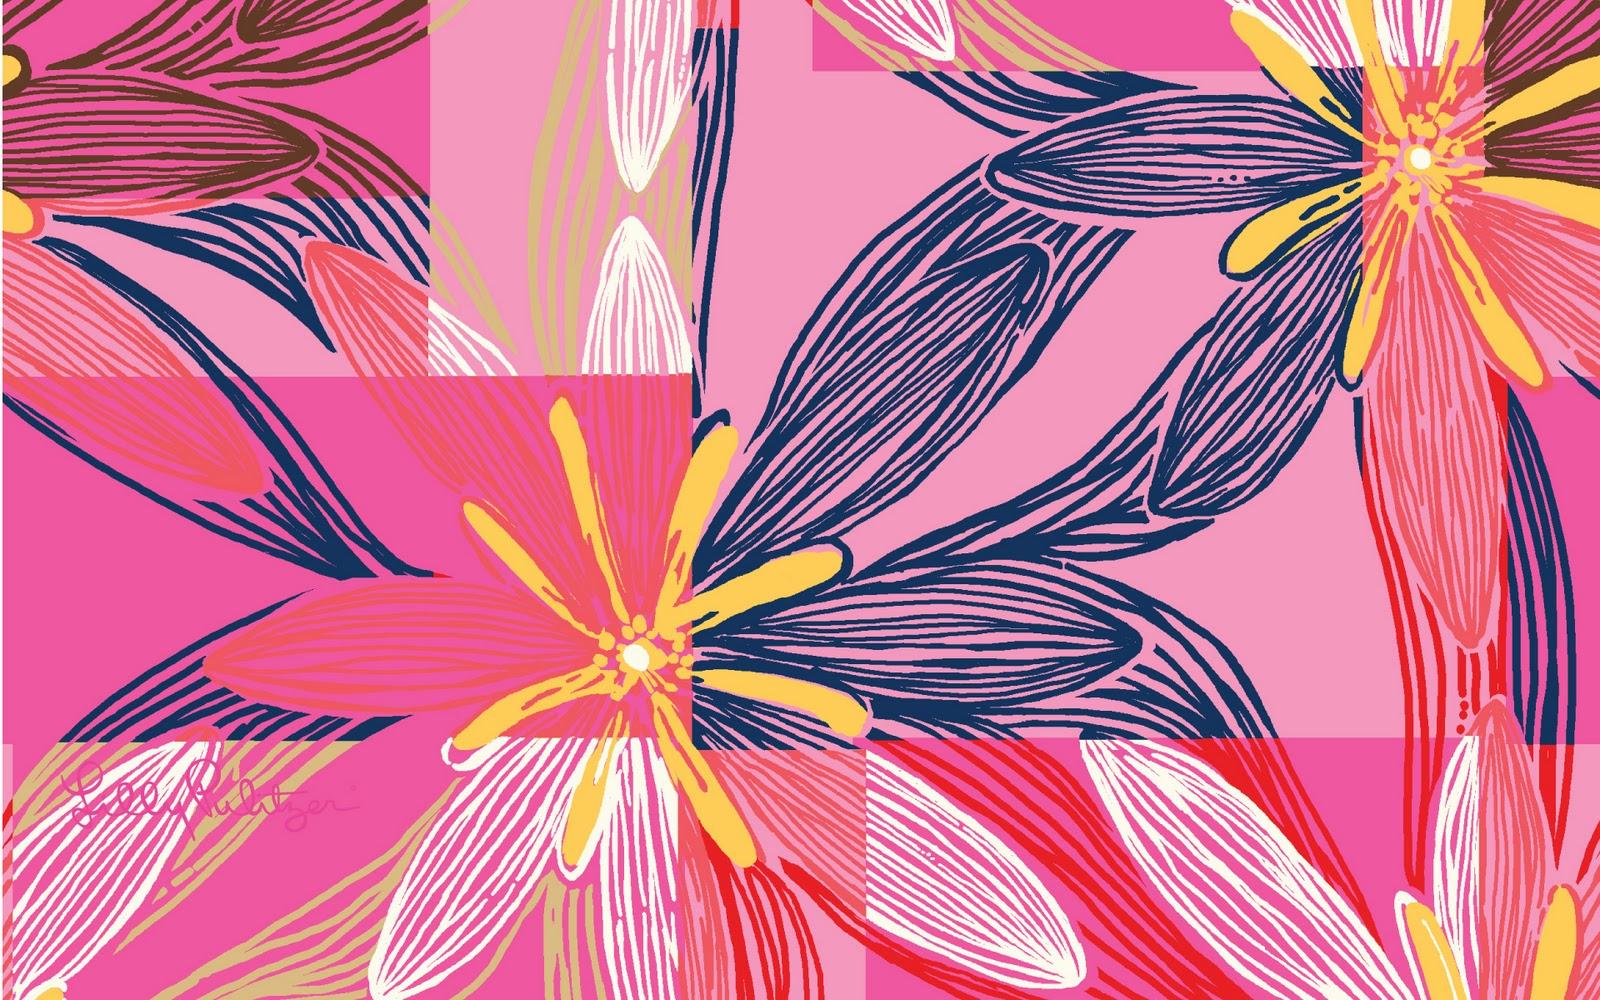 CanadianPrep-Lilly-Desktop-wallpaper-wp5002299